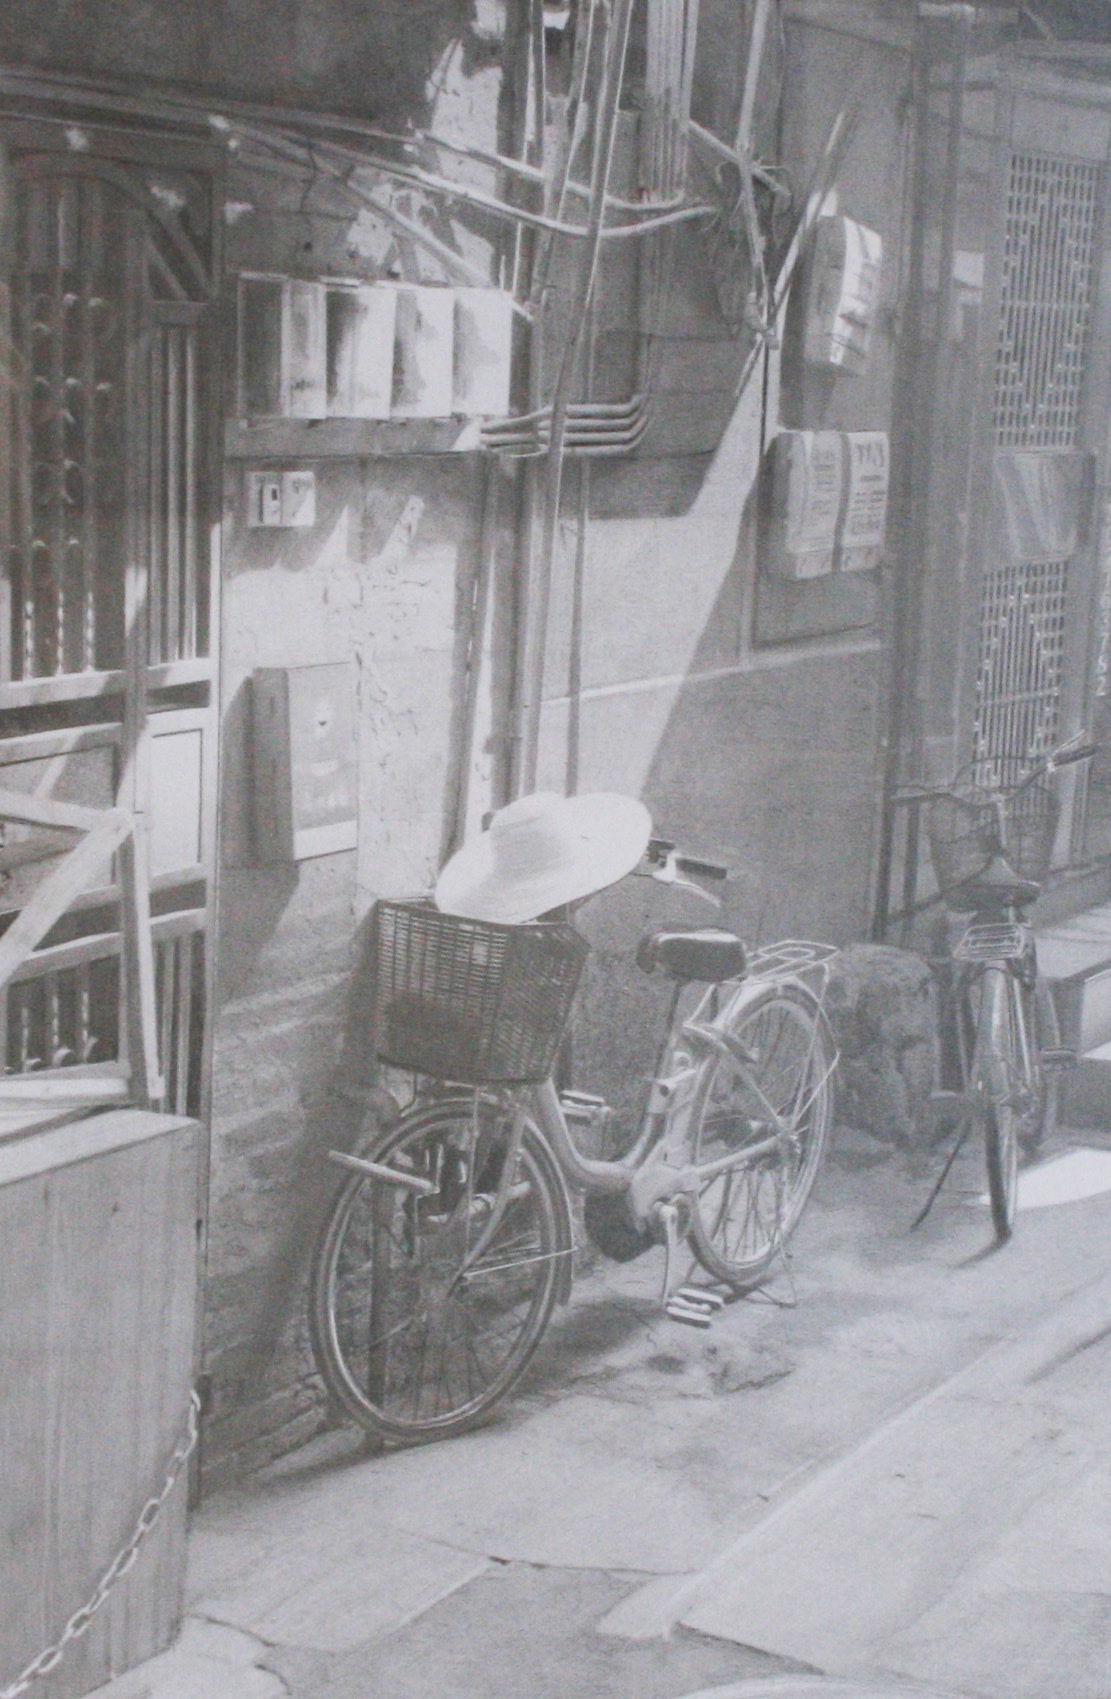 <span class=&#34;link fancybox-details-link&#34;><a href=&#34;/artists/77-paul-cadden/works/638/&#34;>View Detail Page</a></span><div class=&#34;artist&#34;><strong>Paul Cadden</strong></div> <div class=&#34;title&#34;><em>Guangzhou</em></div> <div class=&#34;medium&#34;>Pencil on paper</div> <div class=&#34;dimensions&#34;>framed: 79 x 62.5 cm<br />47 x 31 cm</div>